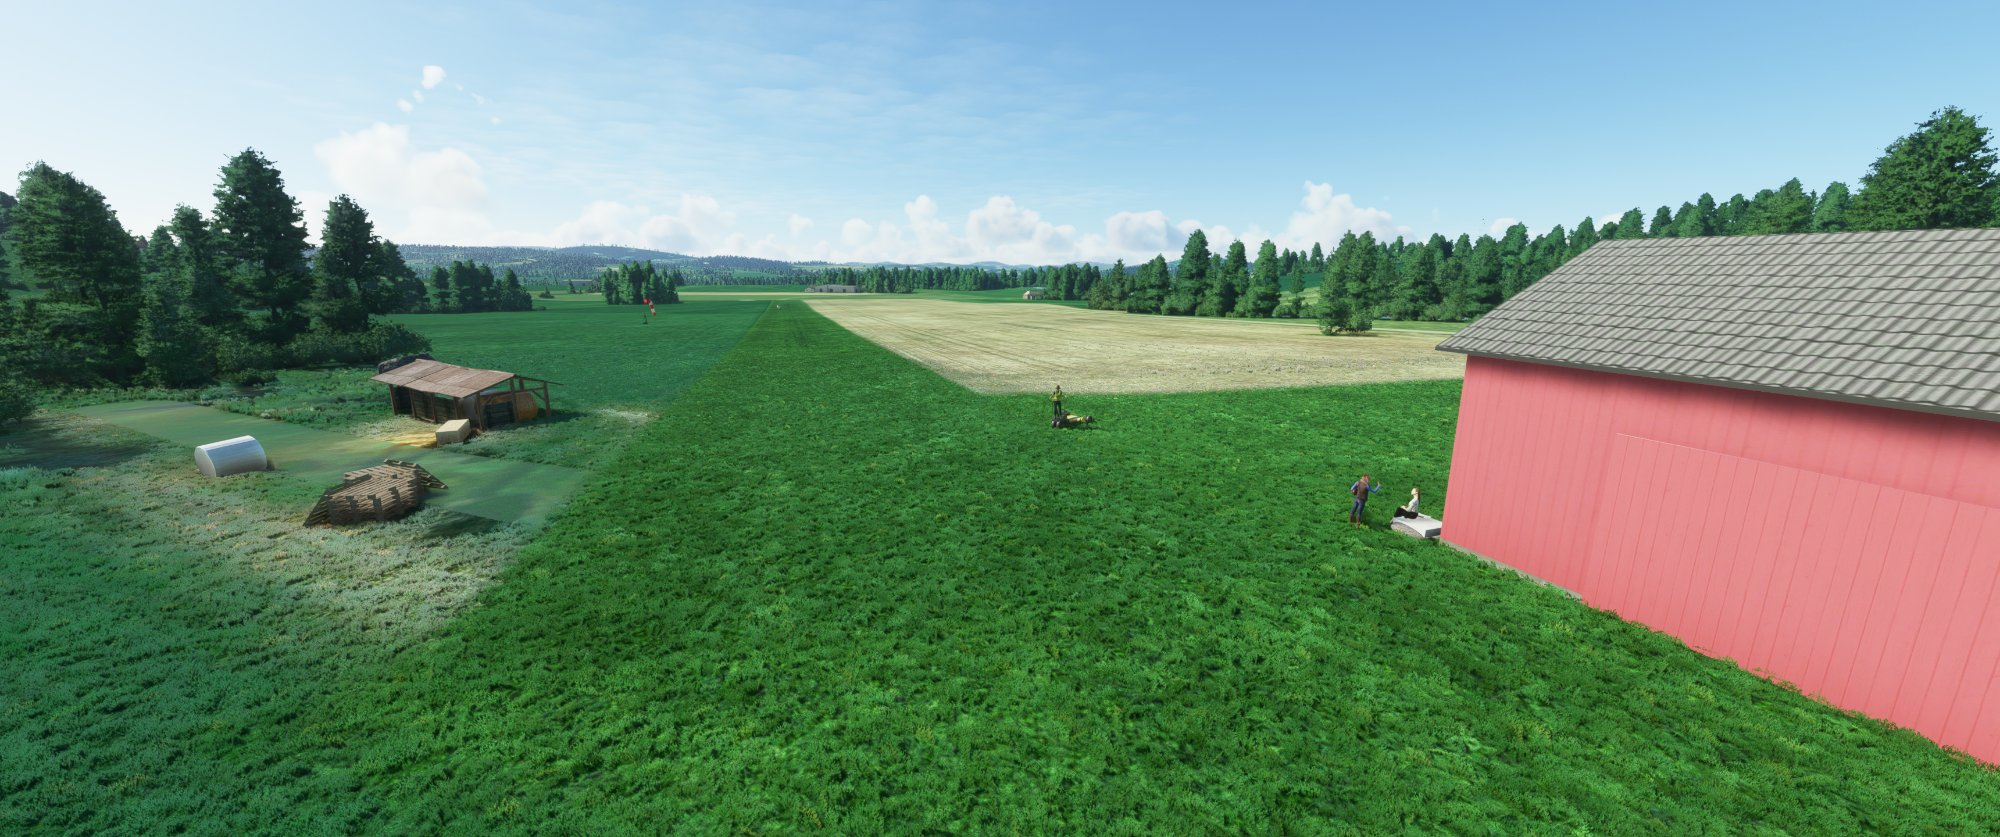 Microsoft Flight Simulator Screenshot 2021.04.25 - 20.20.33.88.jpg